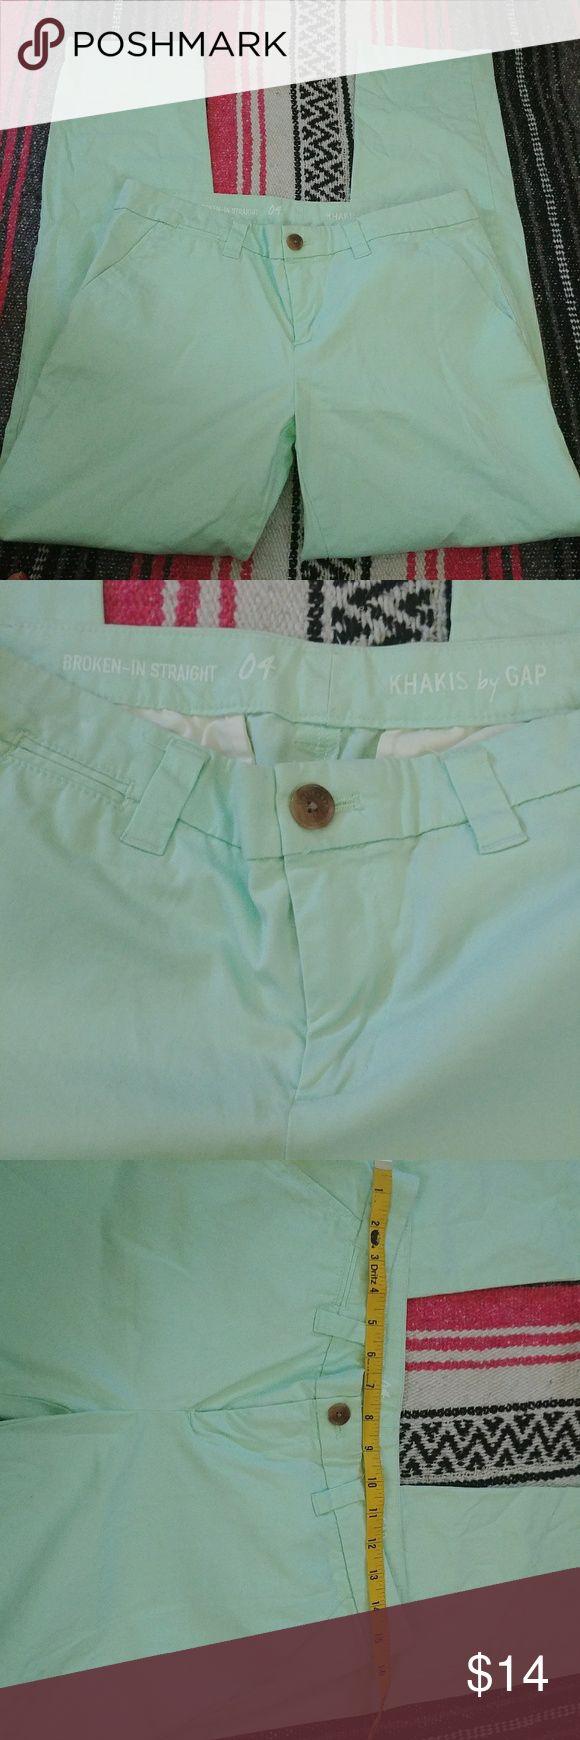 "Gap khaki broken in straight sz 4 mint green jeans 29 1/2 inseam gap broken in straight fit 15 1/2"" waist plea see see photos for details GAP Pants Straight Leg"